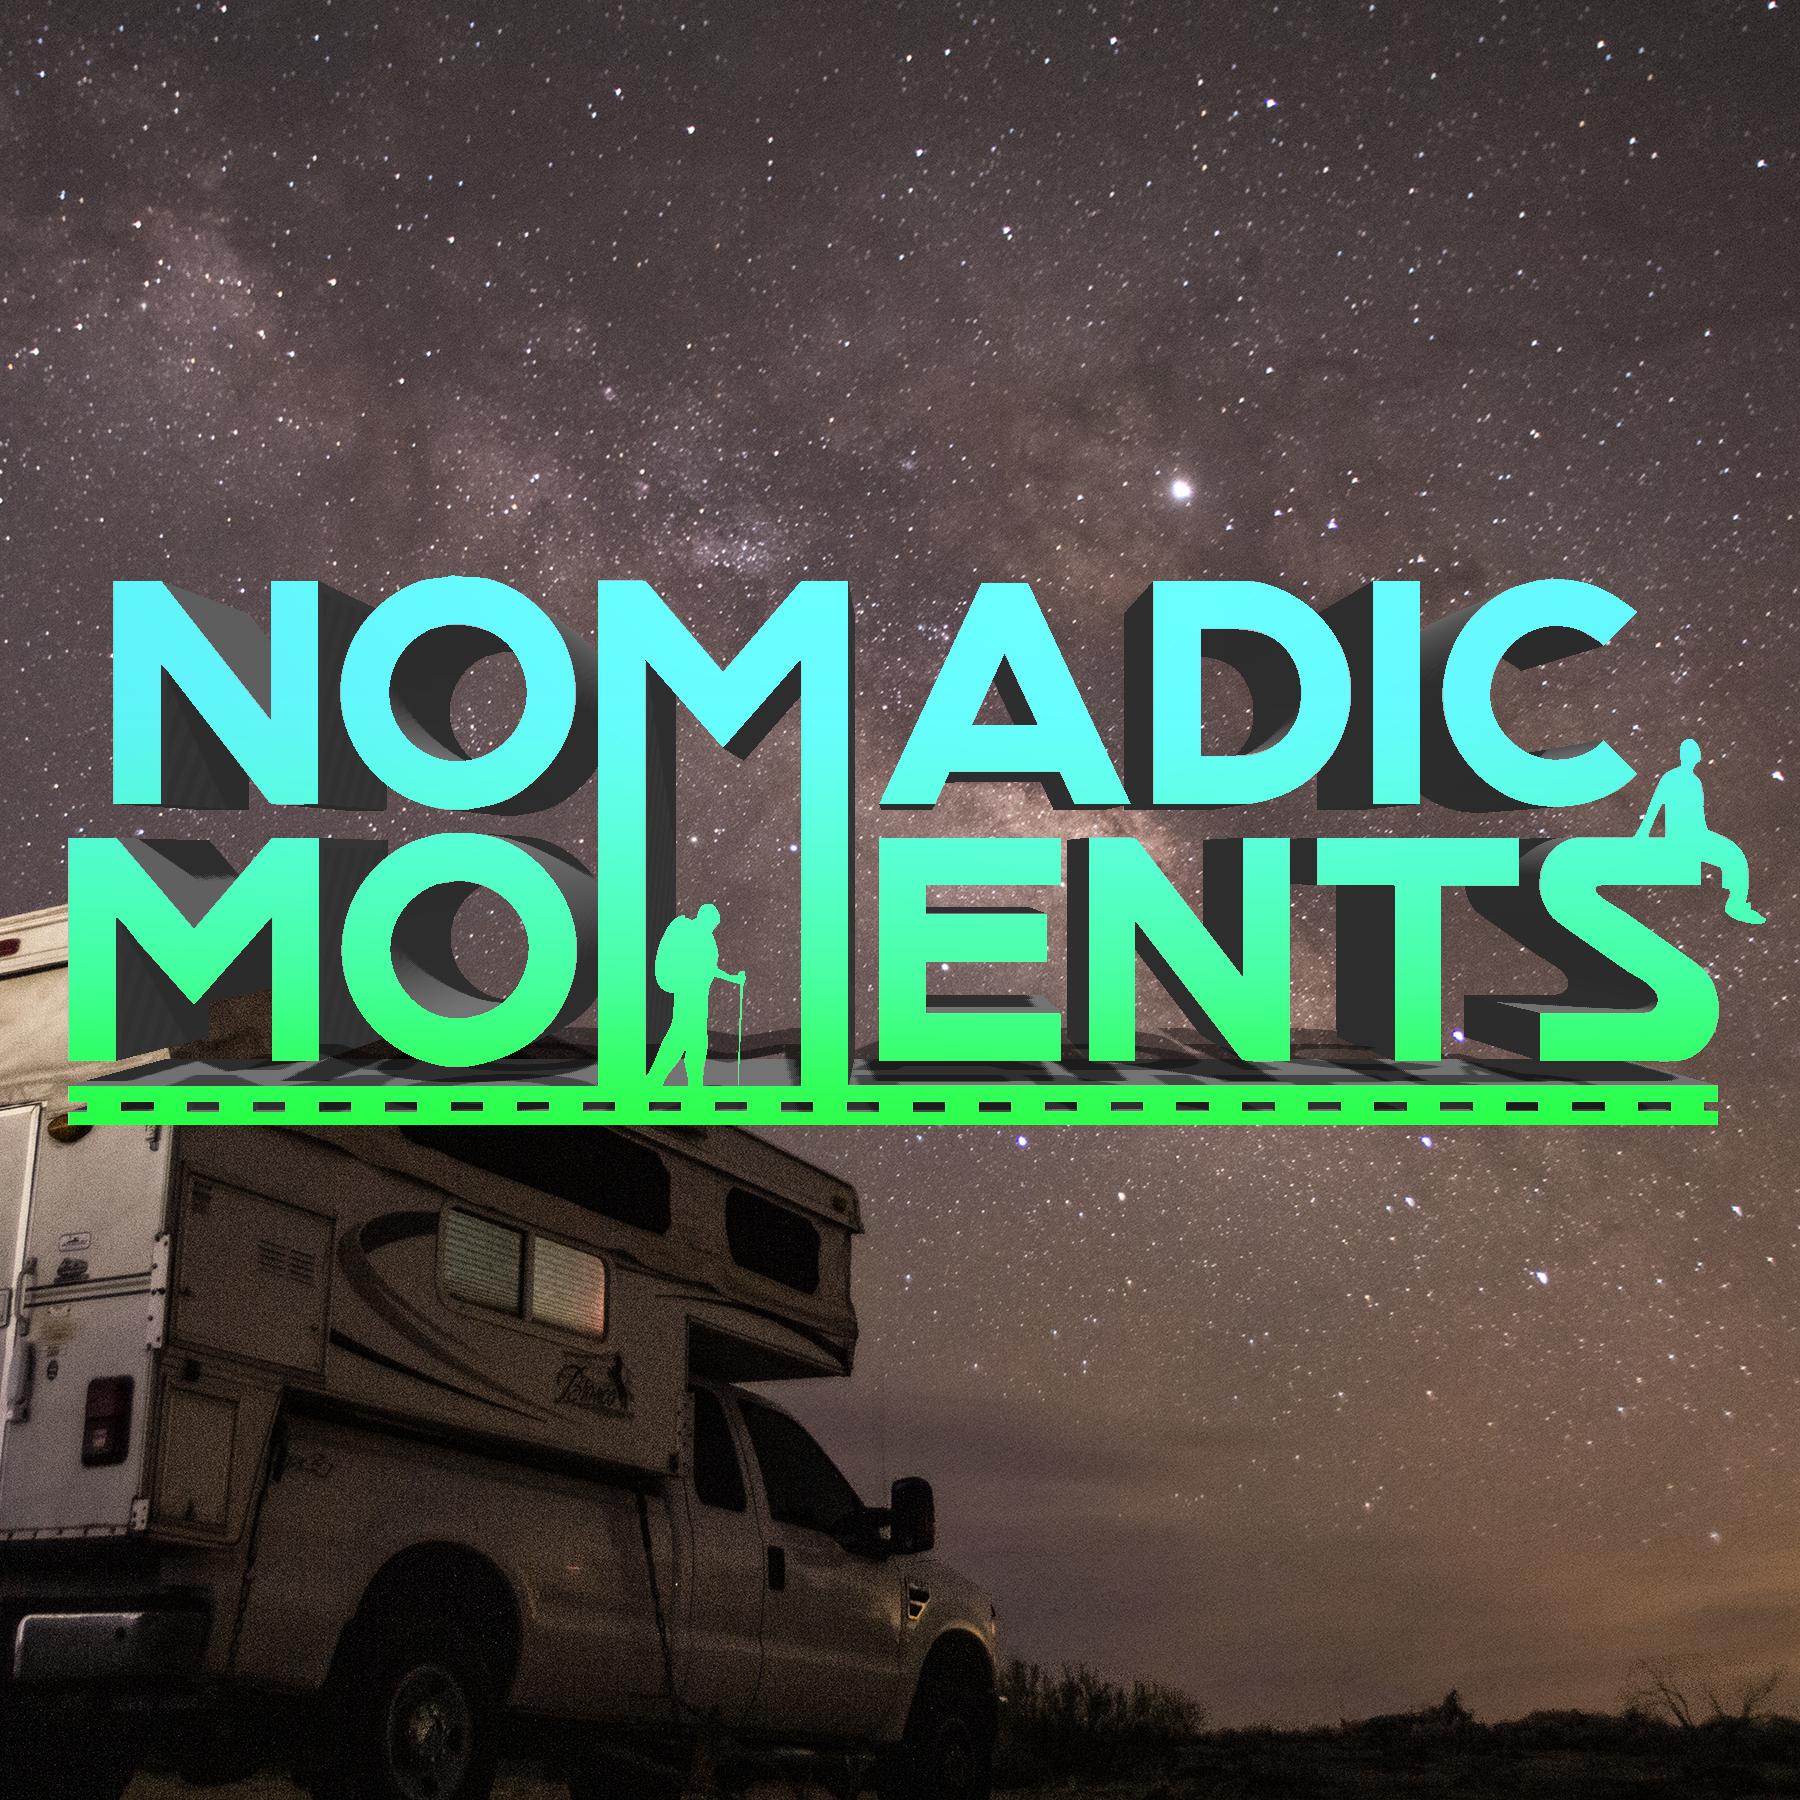 Nomadicmoments   the stars